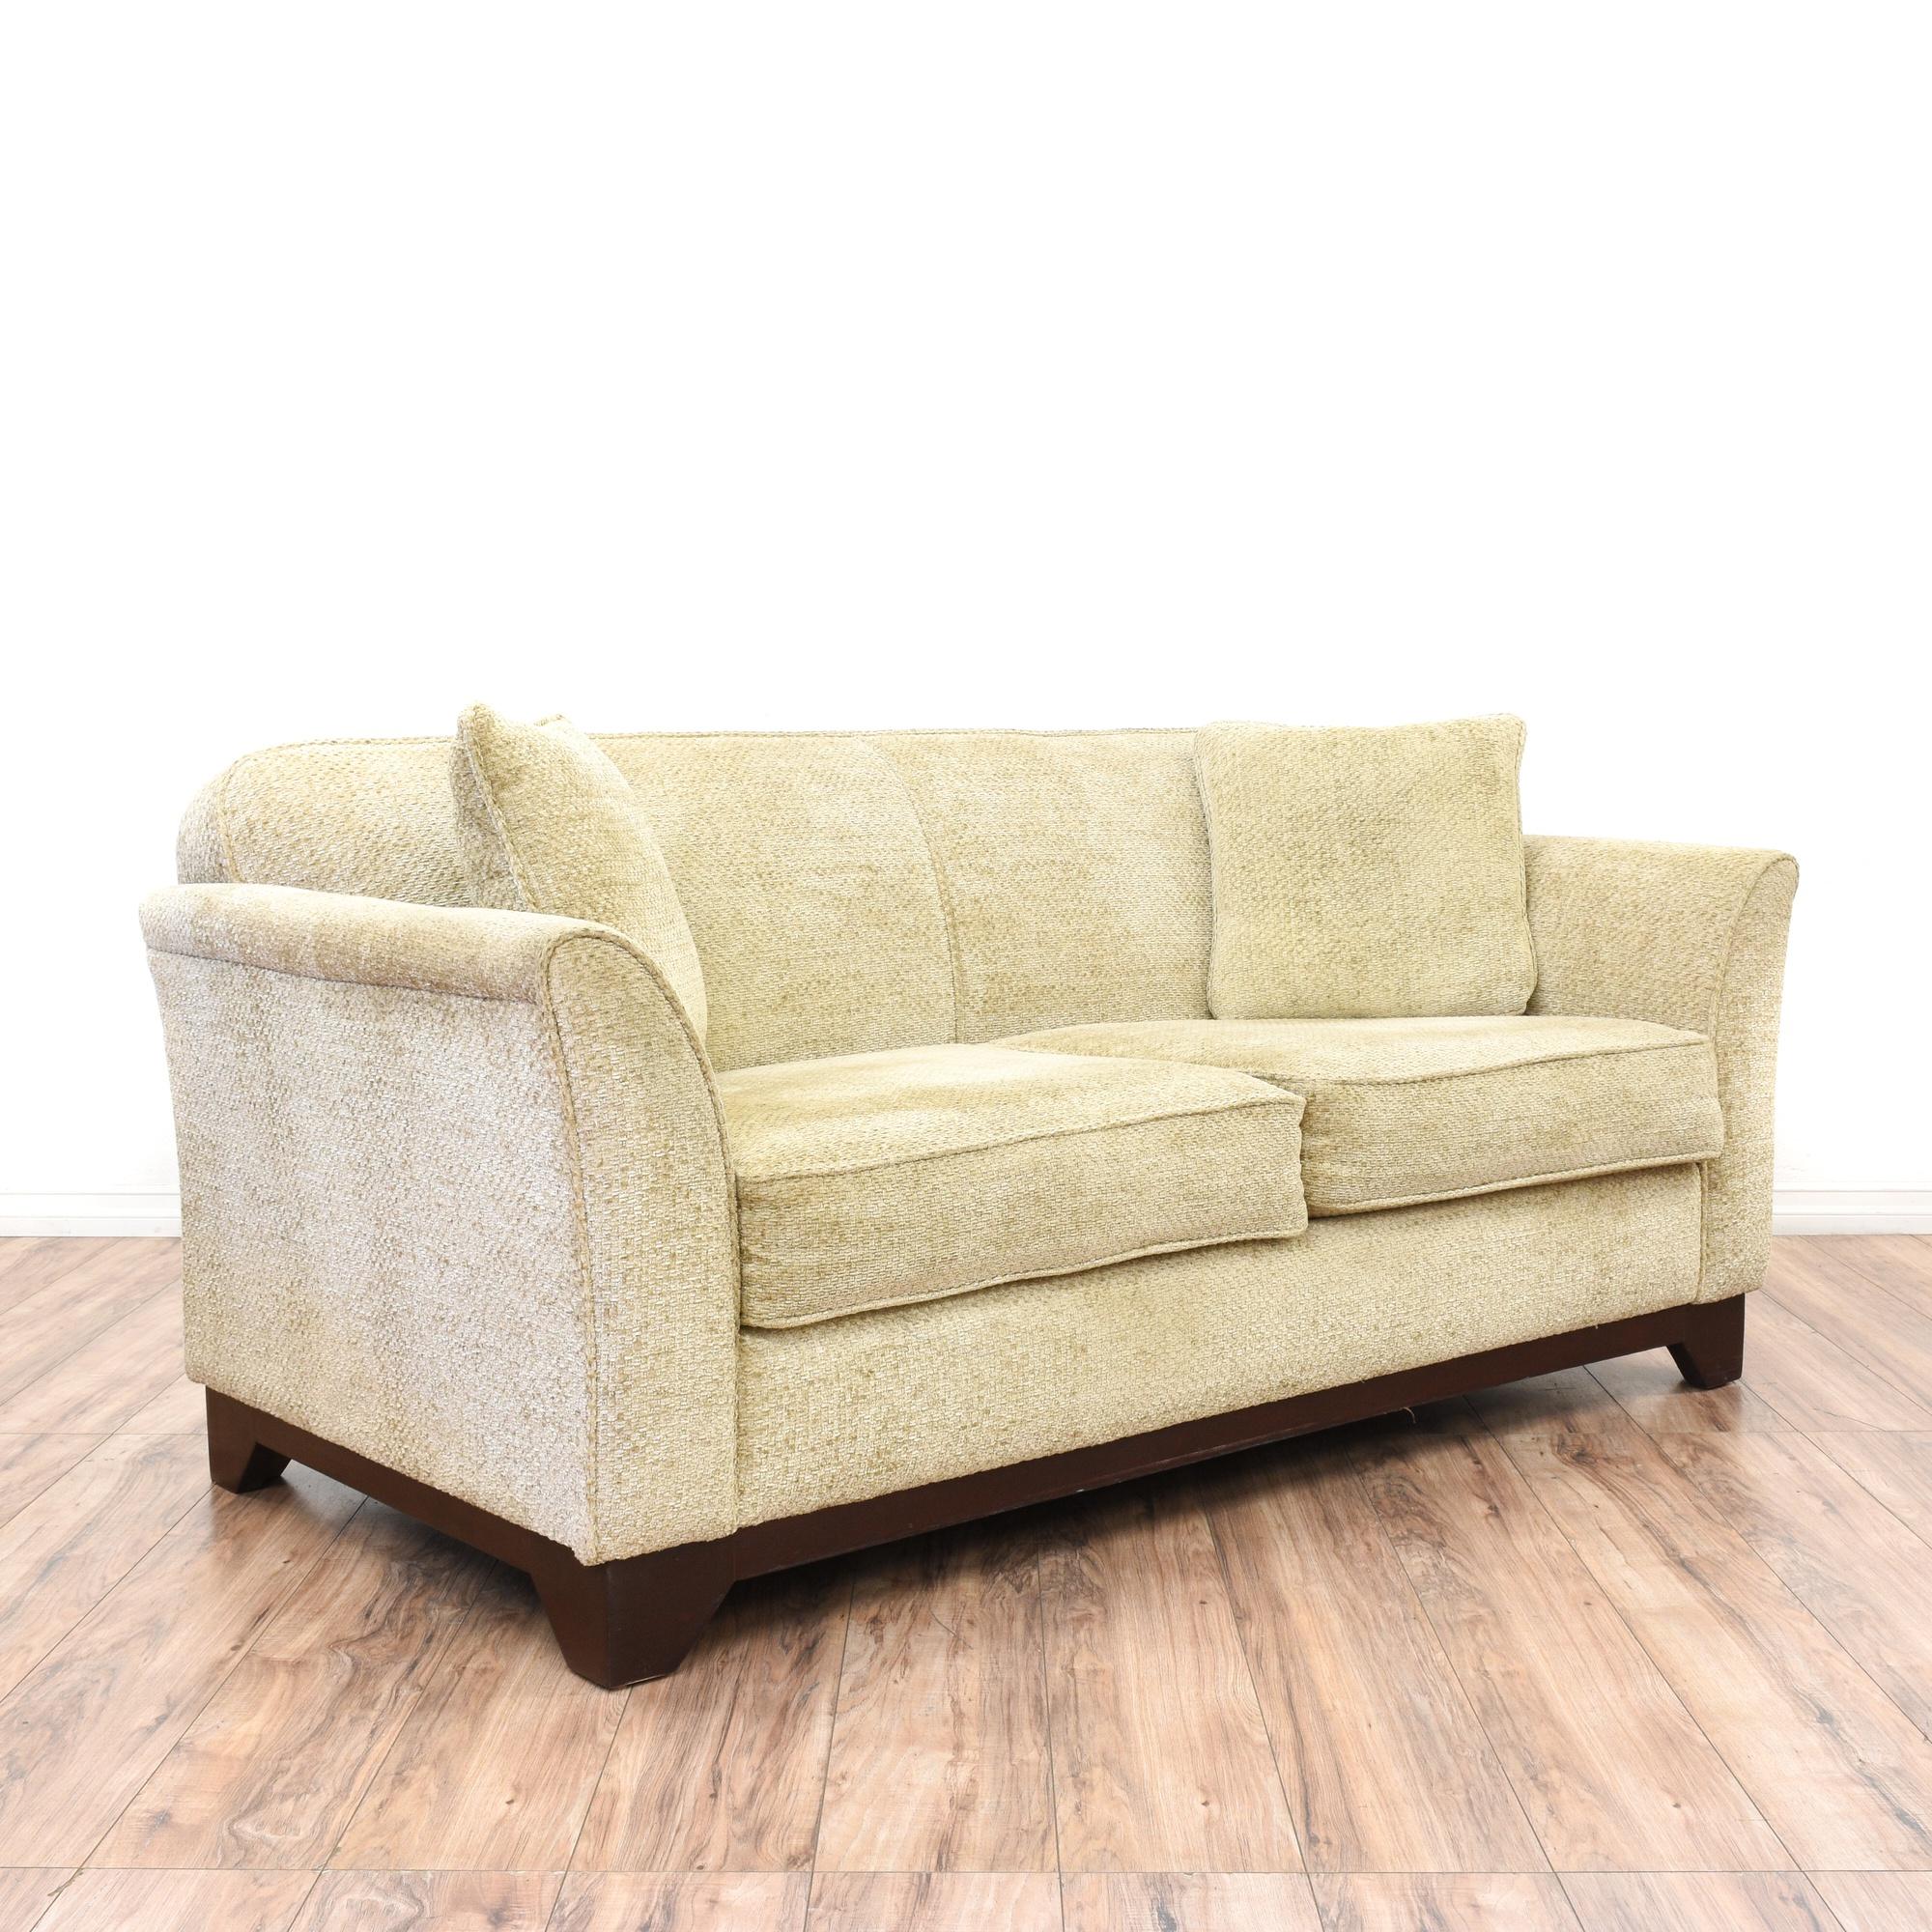 Loveseat sleeper sofa bed loveseat vintage furniture san for Sofa bed los angeles